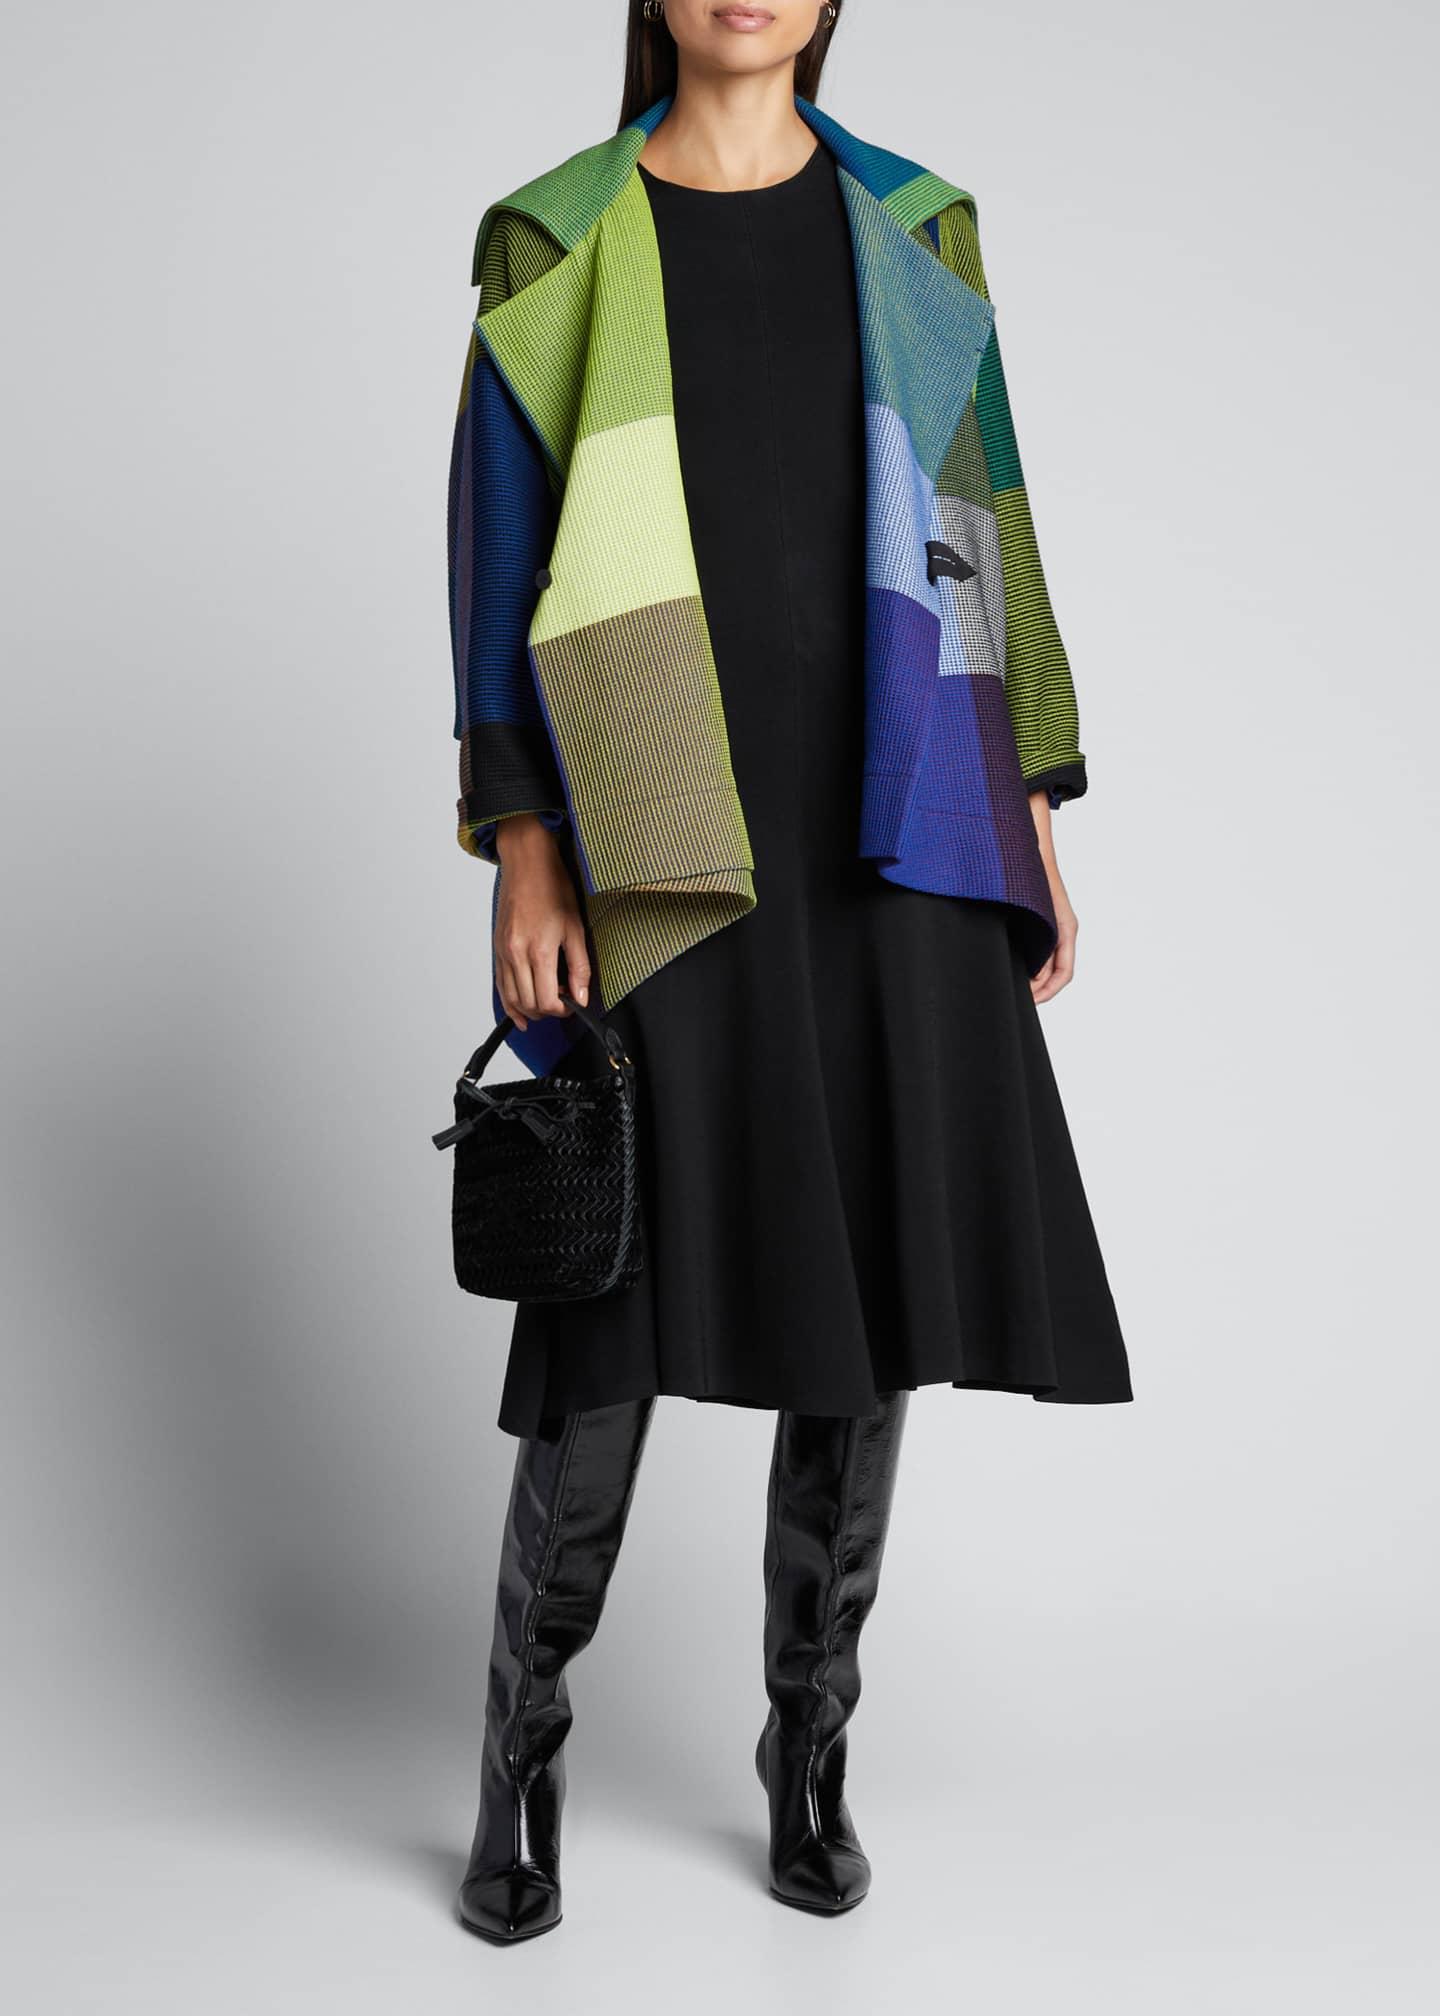 Issey Miyake Textured Wrapped Wool Short Coat